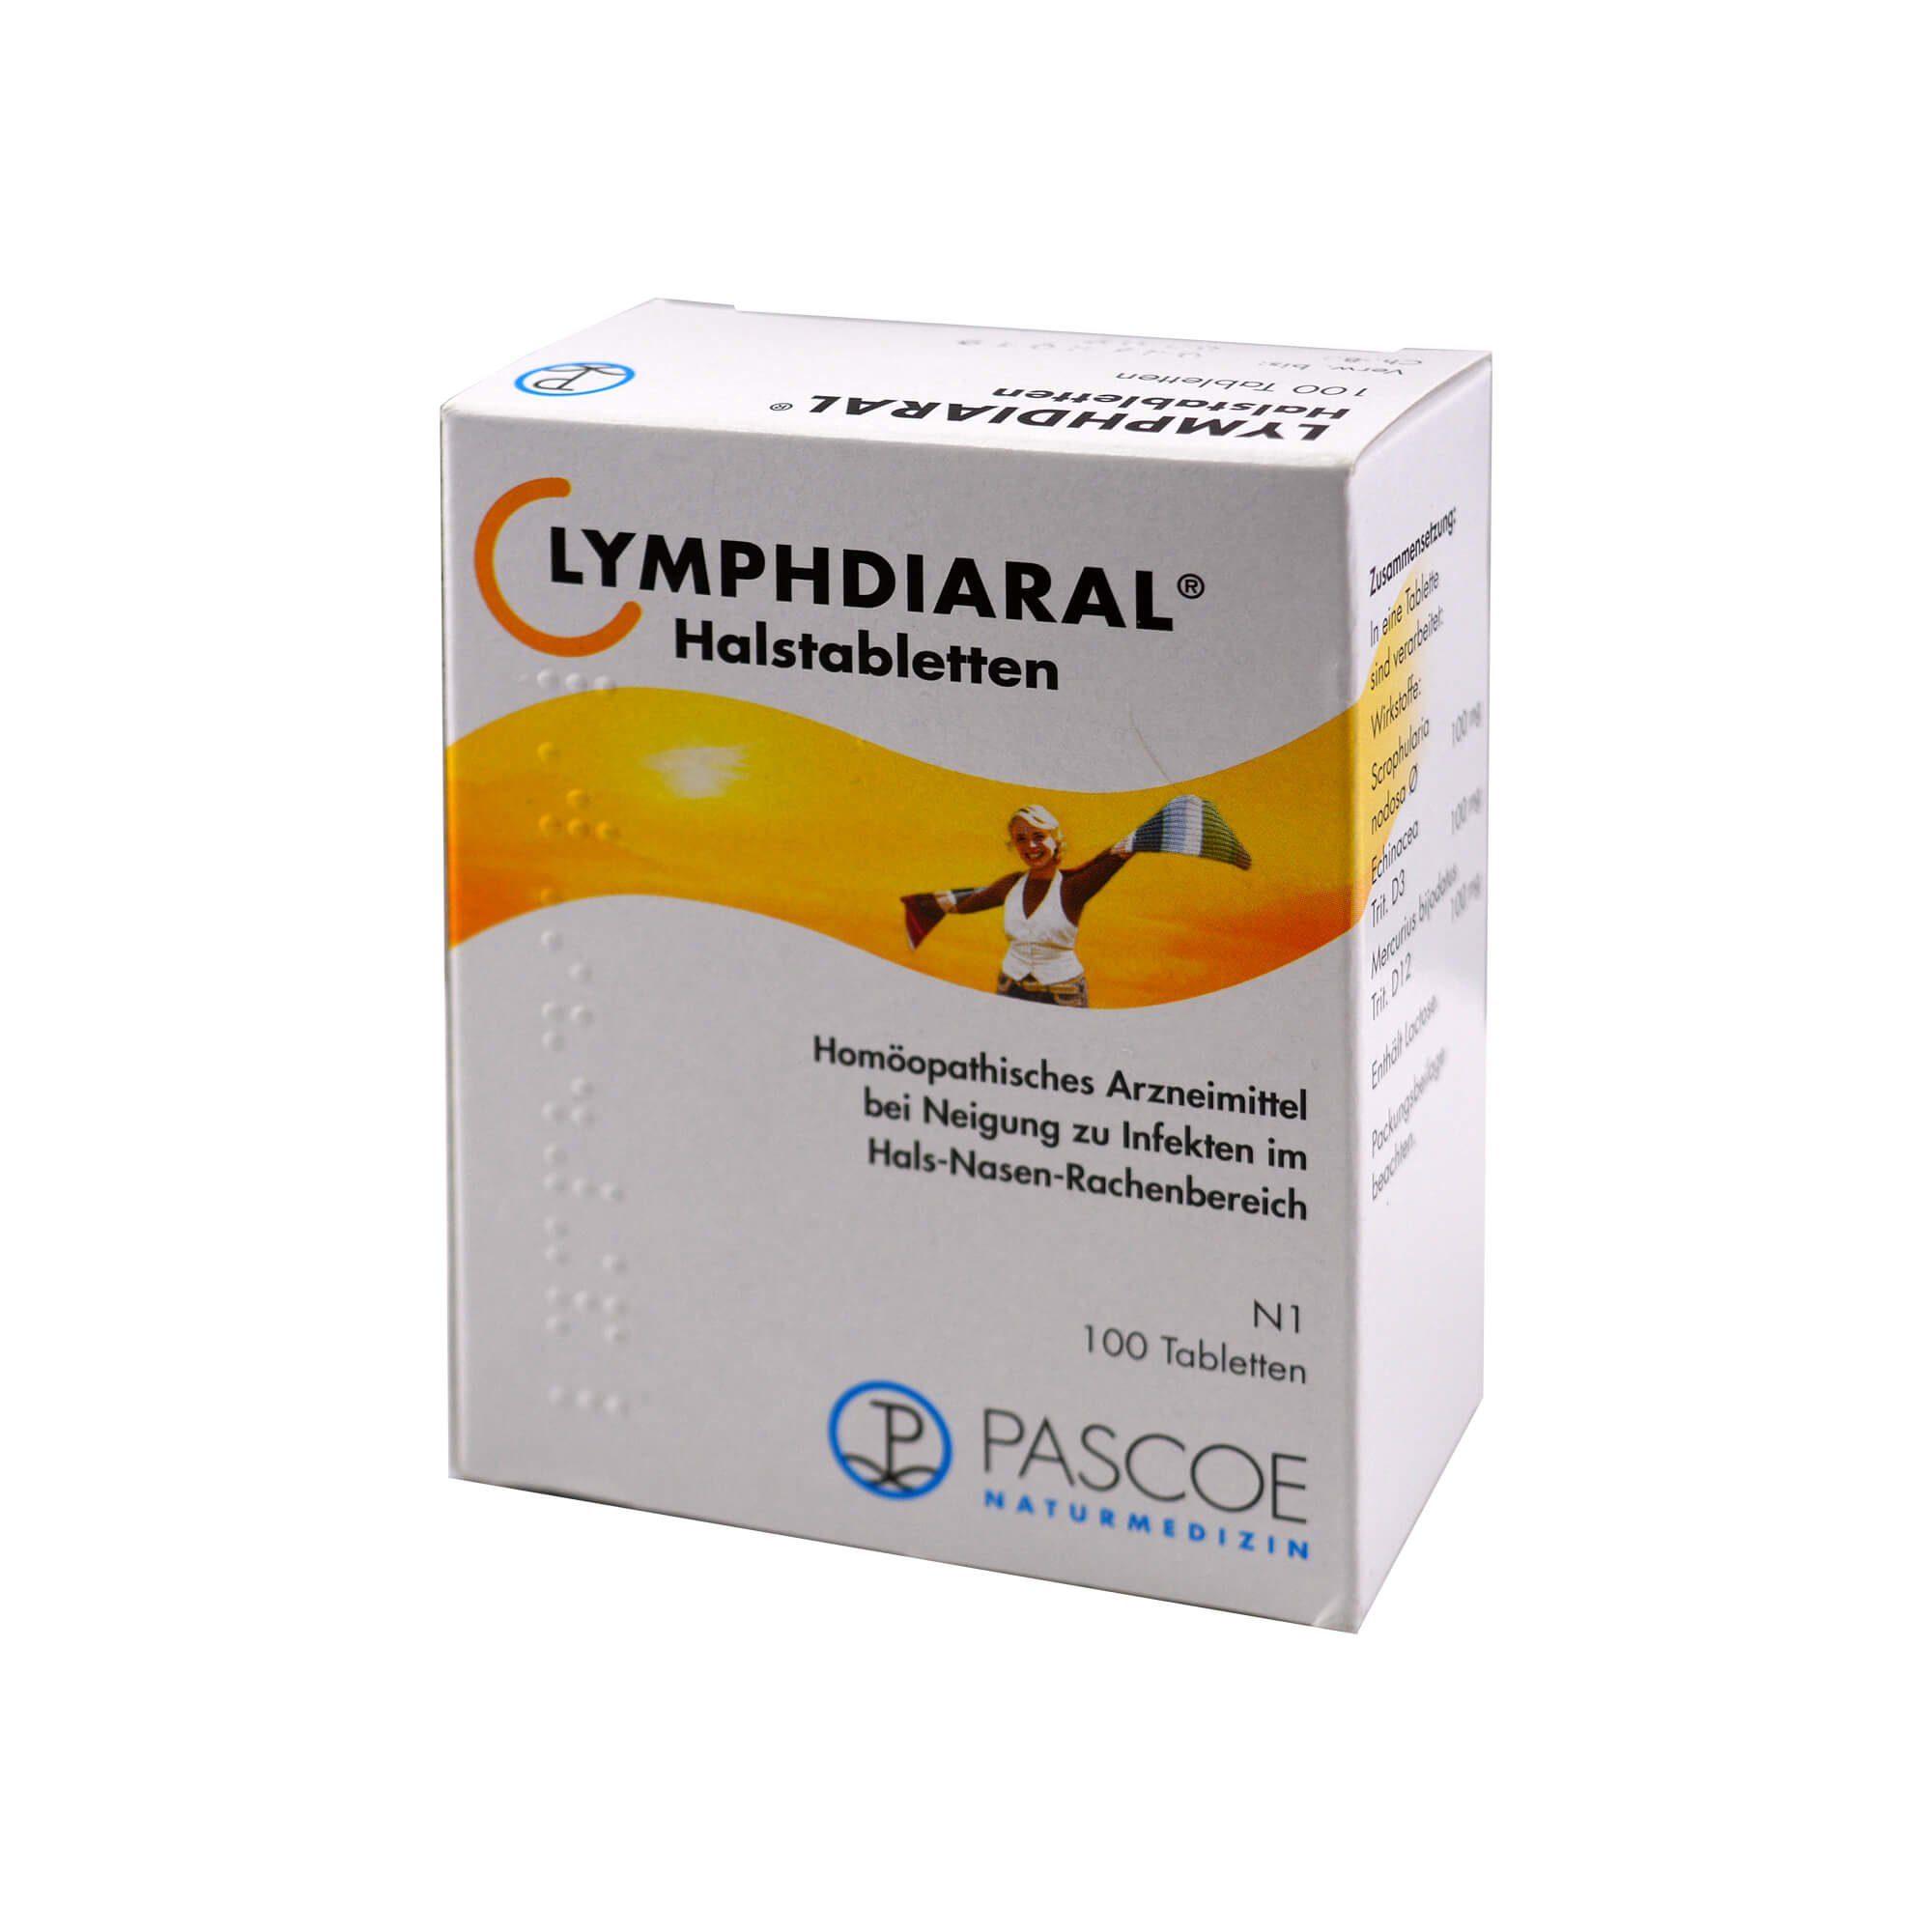 Lymphdiaral Halstabletten, 100 St